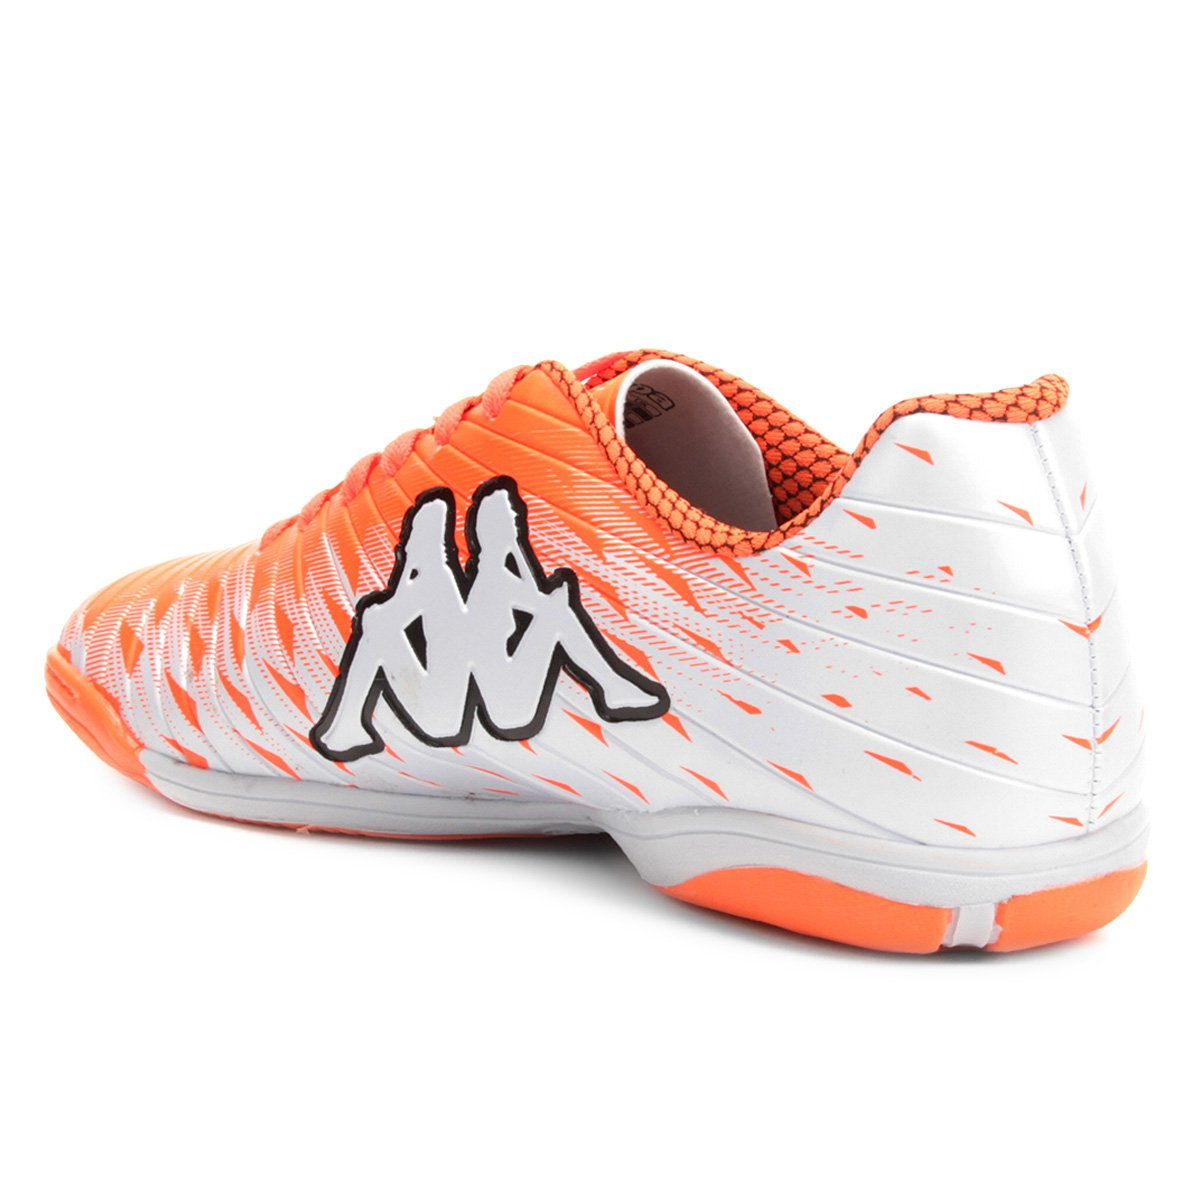 Chuteira Futsal Kappa Thunder - Branco e Laranja - Compre Agora ... 6470554732013